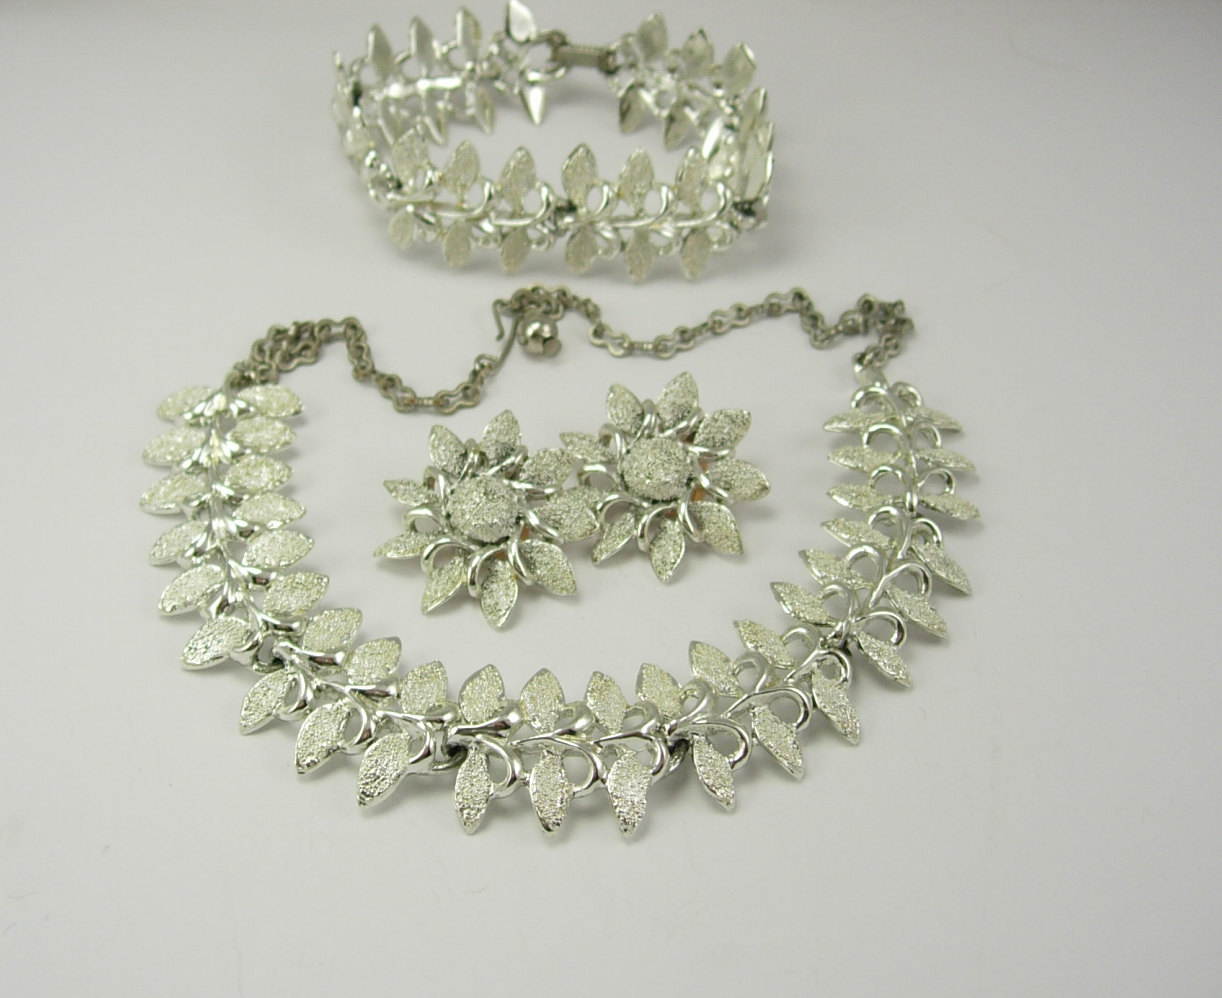 Vintage Fancy Parure Necklace Clip On Earrings Bracelet Set Wedding Anniversary